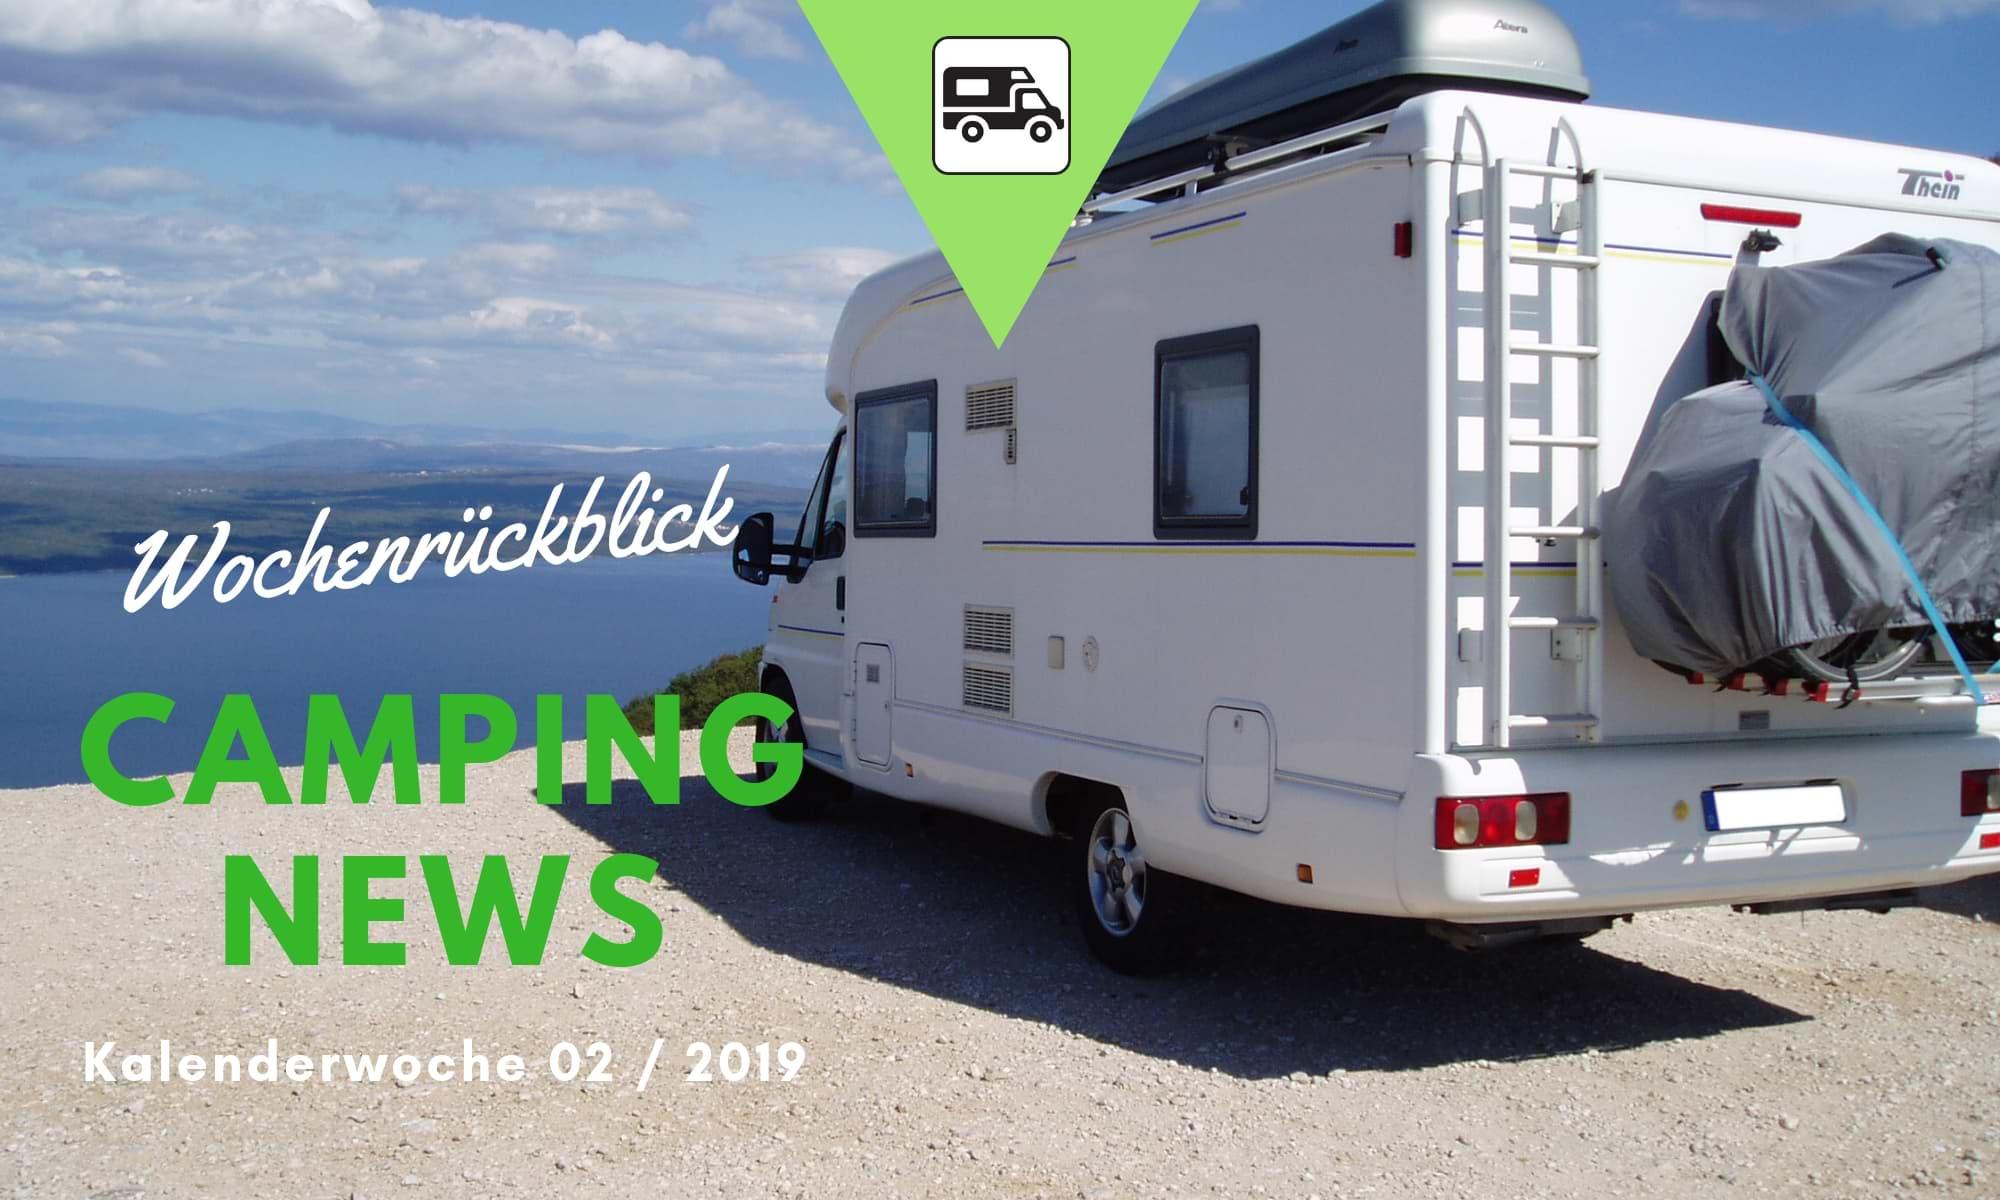 Wochenrückblick Camping News KW02-2019